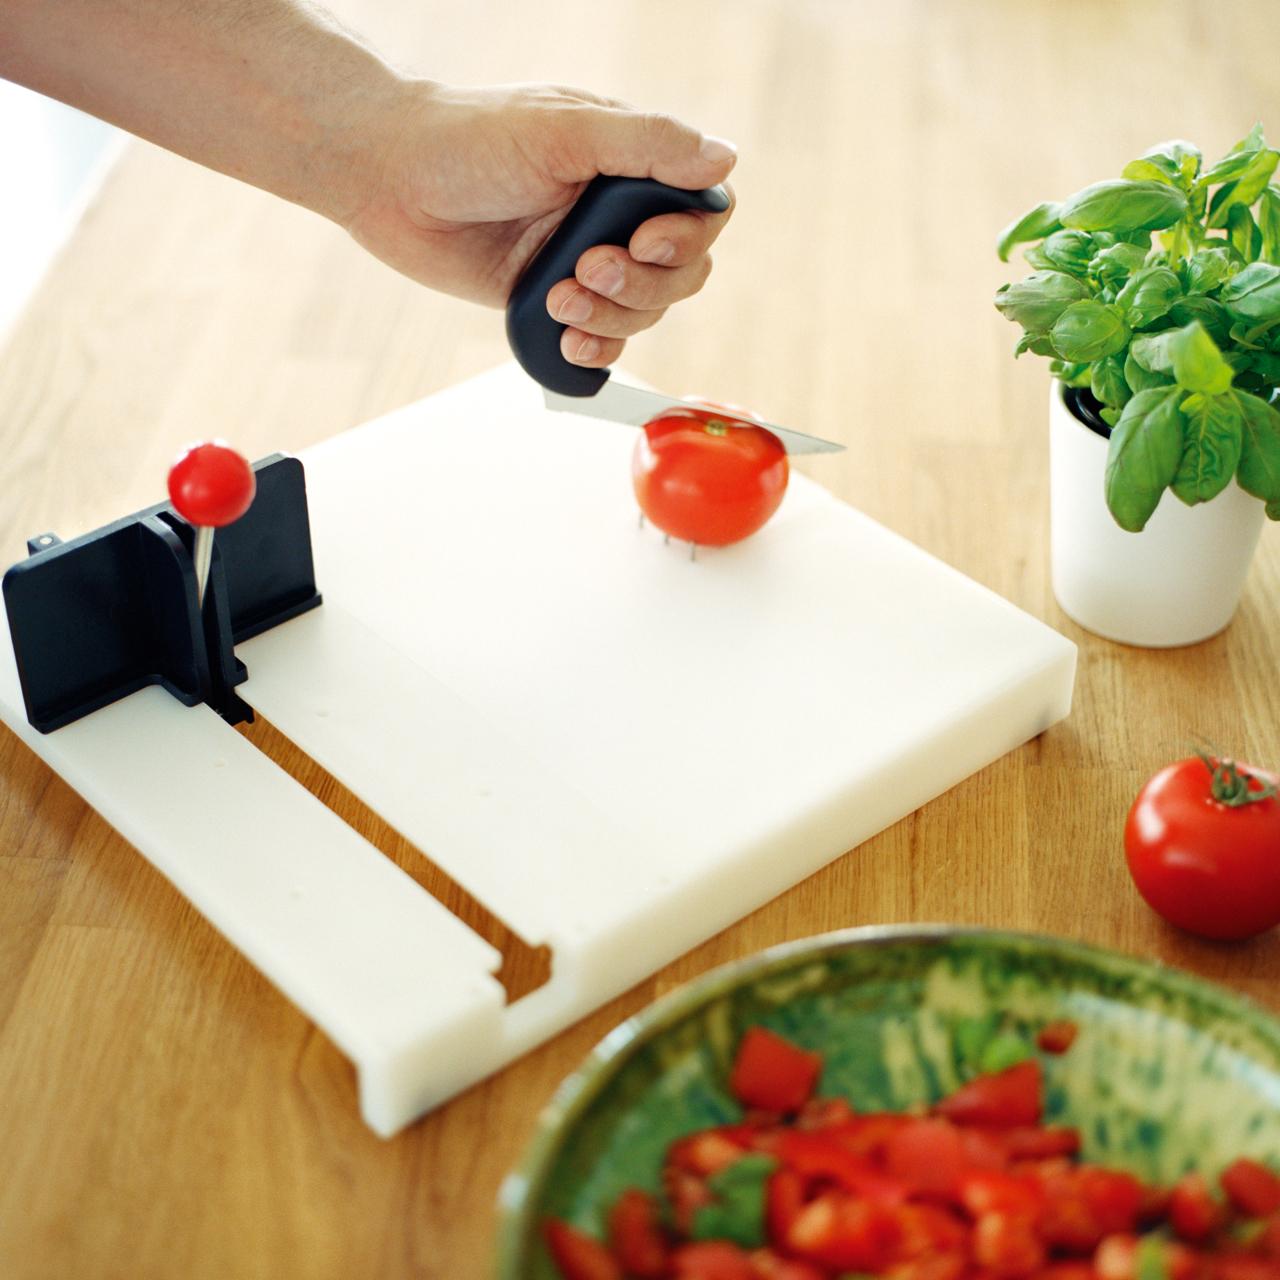 etac fix one handed cutting board